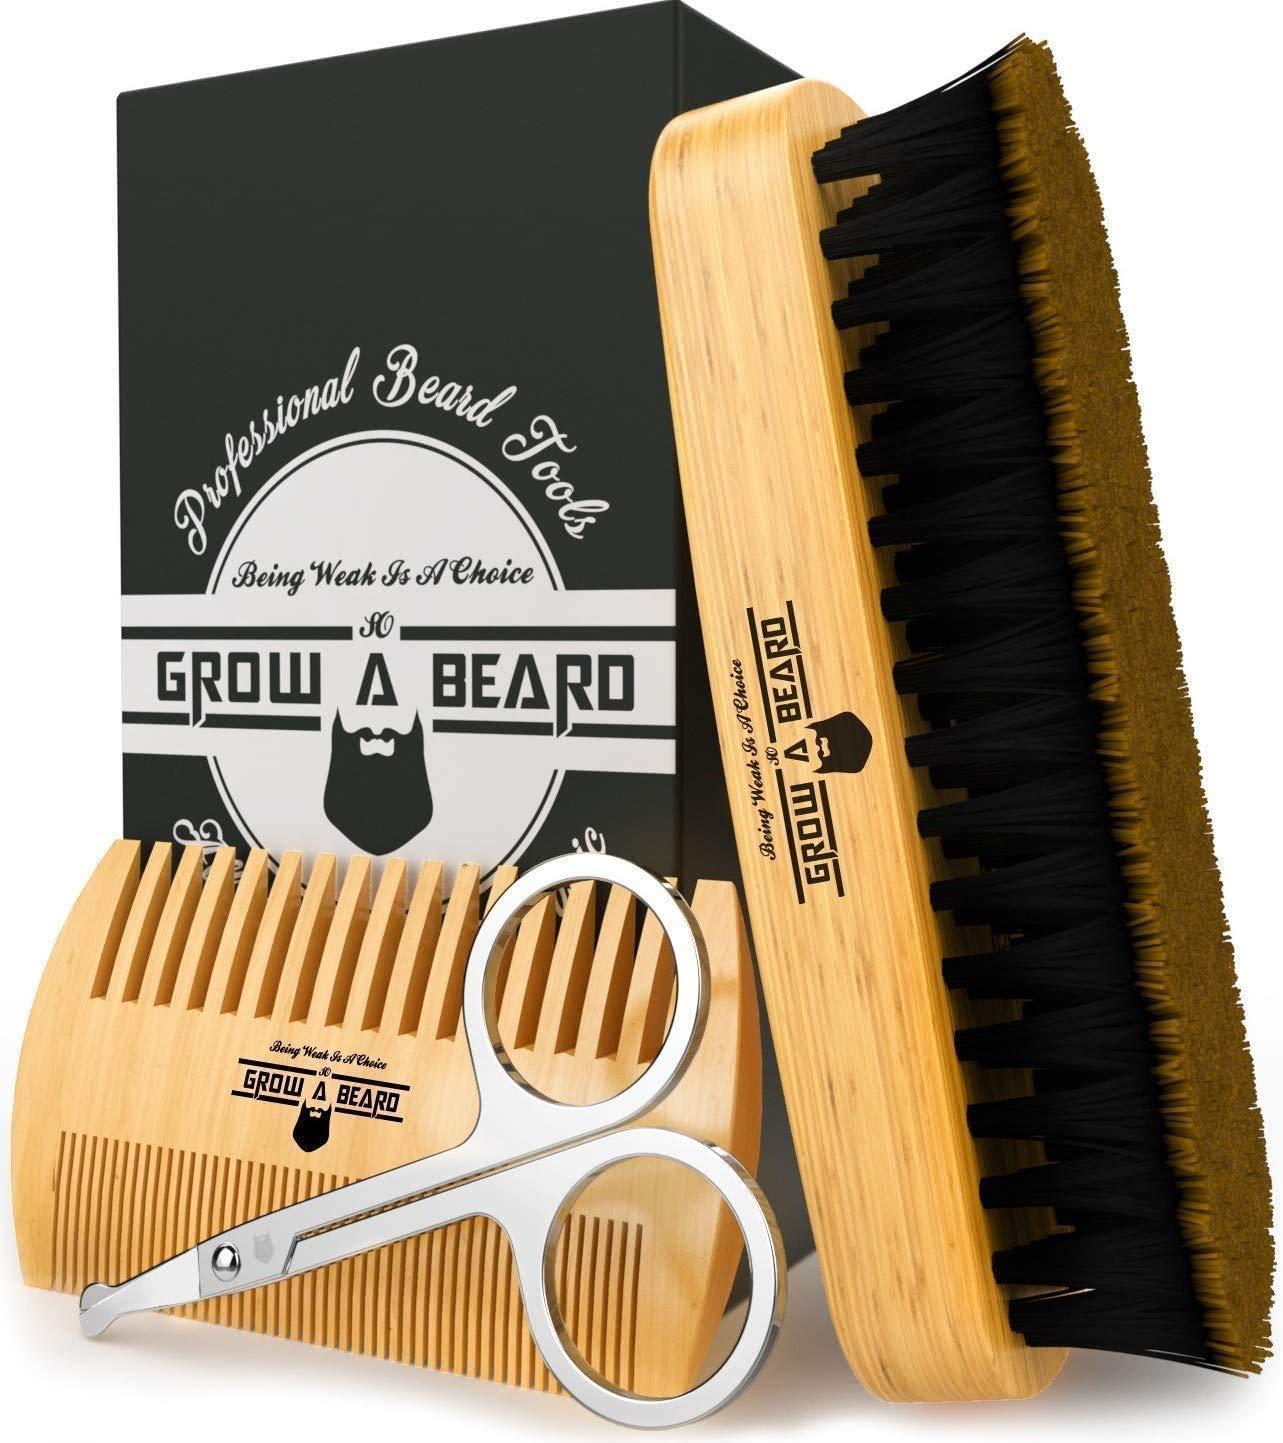 Beard Brush & Beard Comb Set w/ Beard Scissors Grooming Kit, Beard Brush For Men, Natural Boar Bristle Beard Brush, Men's Beard Brush, Boars Hair Beard Brush, Wood Comb Great for Mustaches